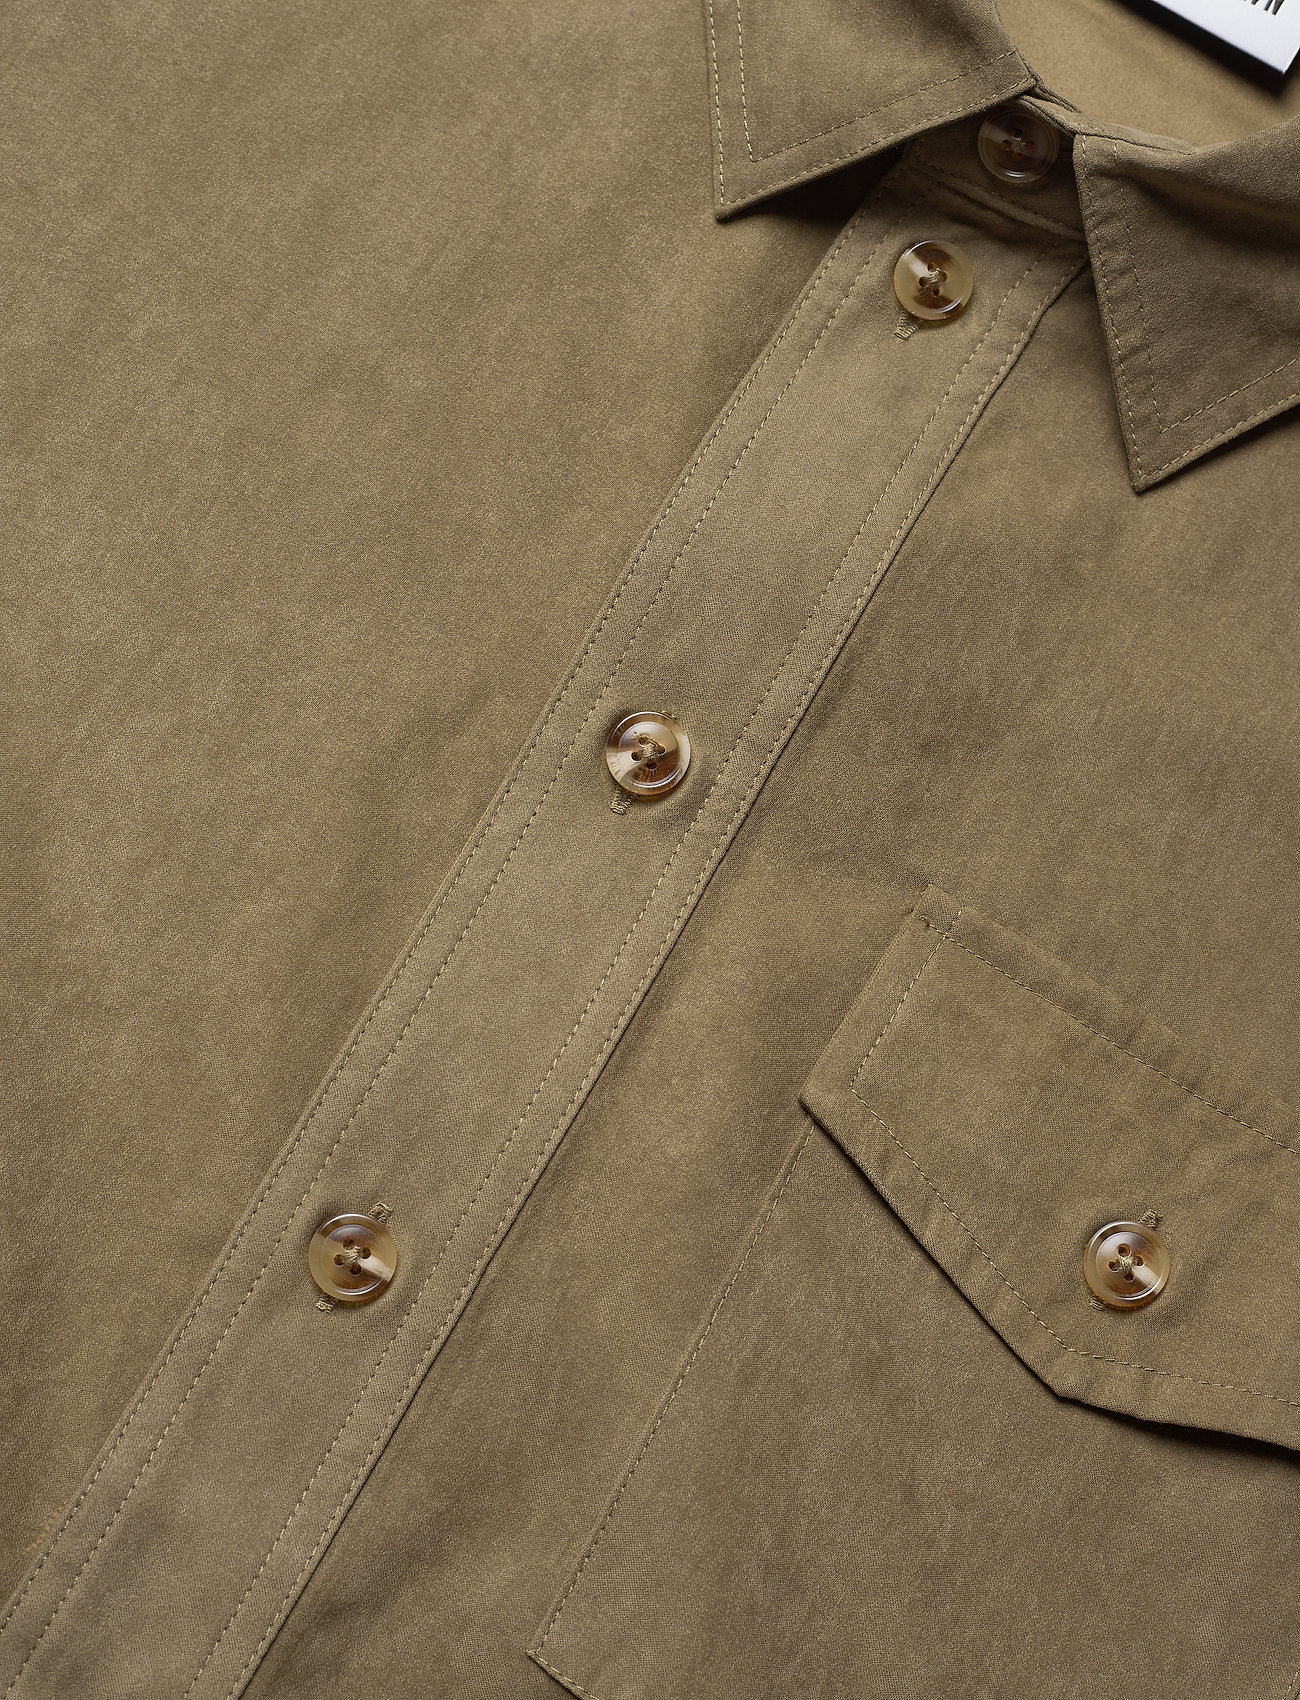 HAN Kjøbenhavn - Army Shirt - tops - grey - 6